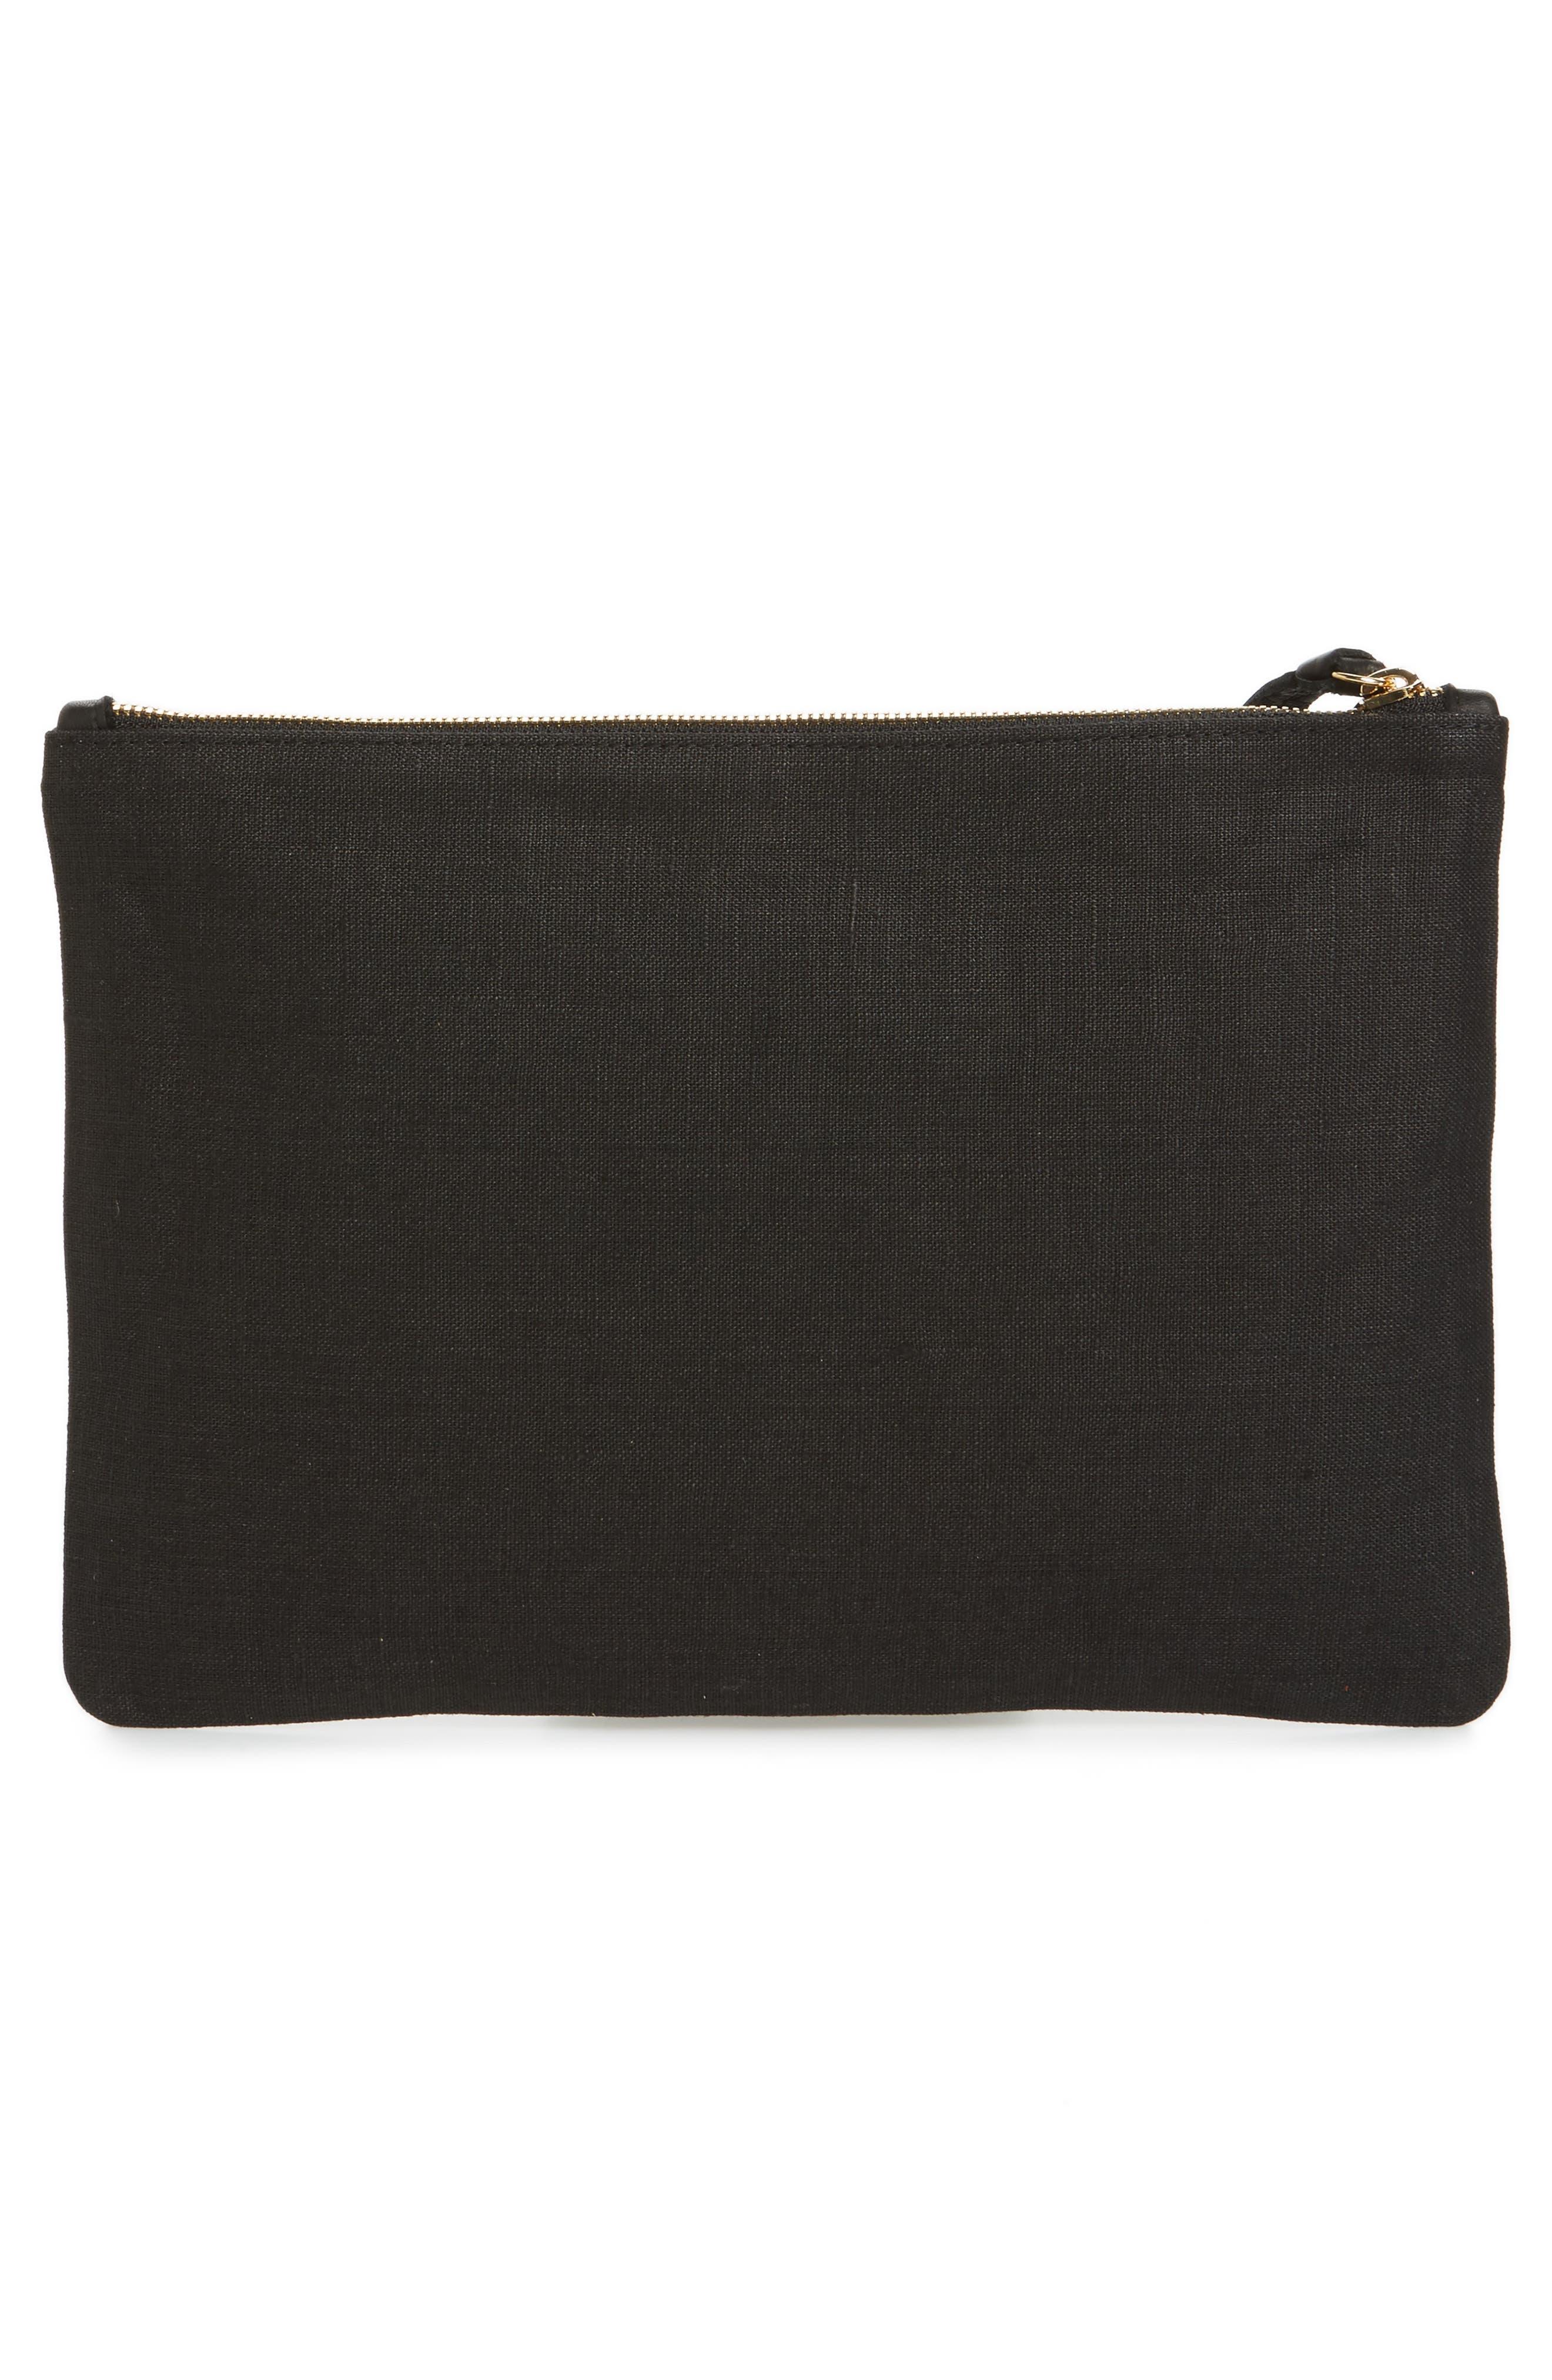 Bougainvillea Linen Clutch,                             Alternate thumbnail 2, color,                             Black Linen With Pink